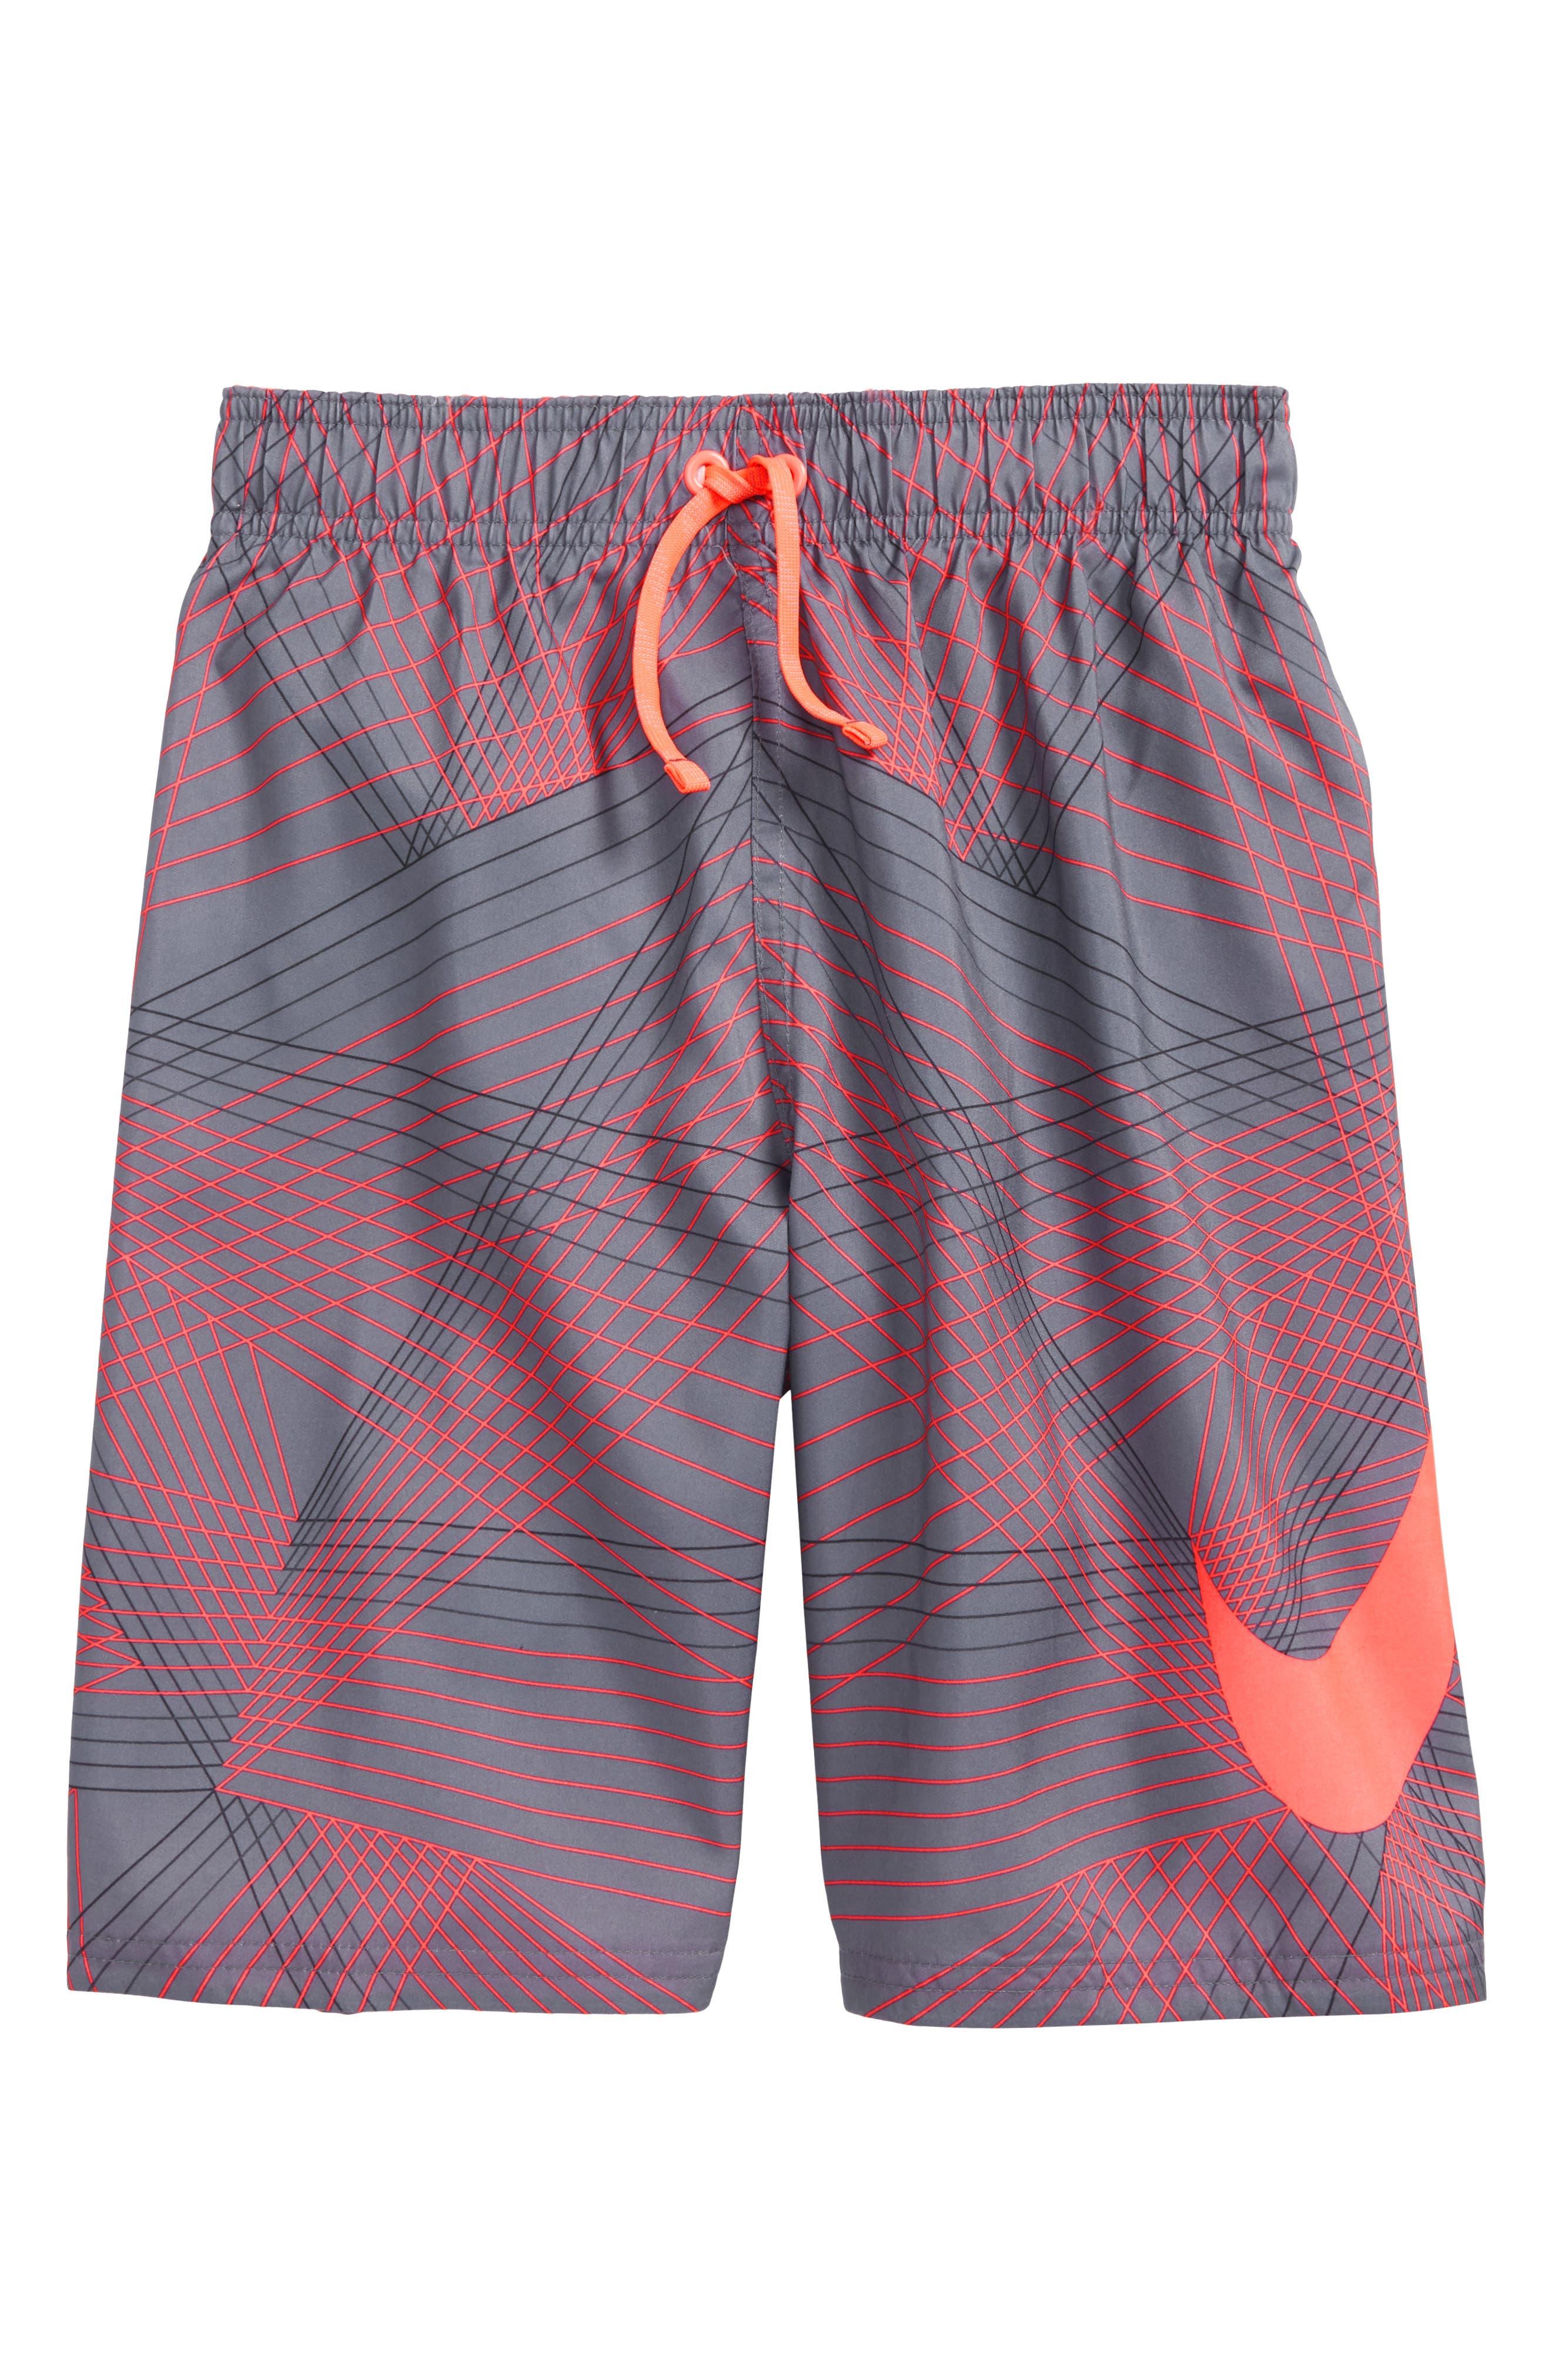 Breaker Volley Shorts,                         Main,                         color, 020